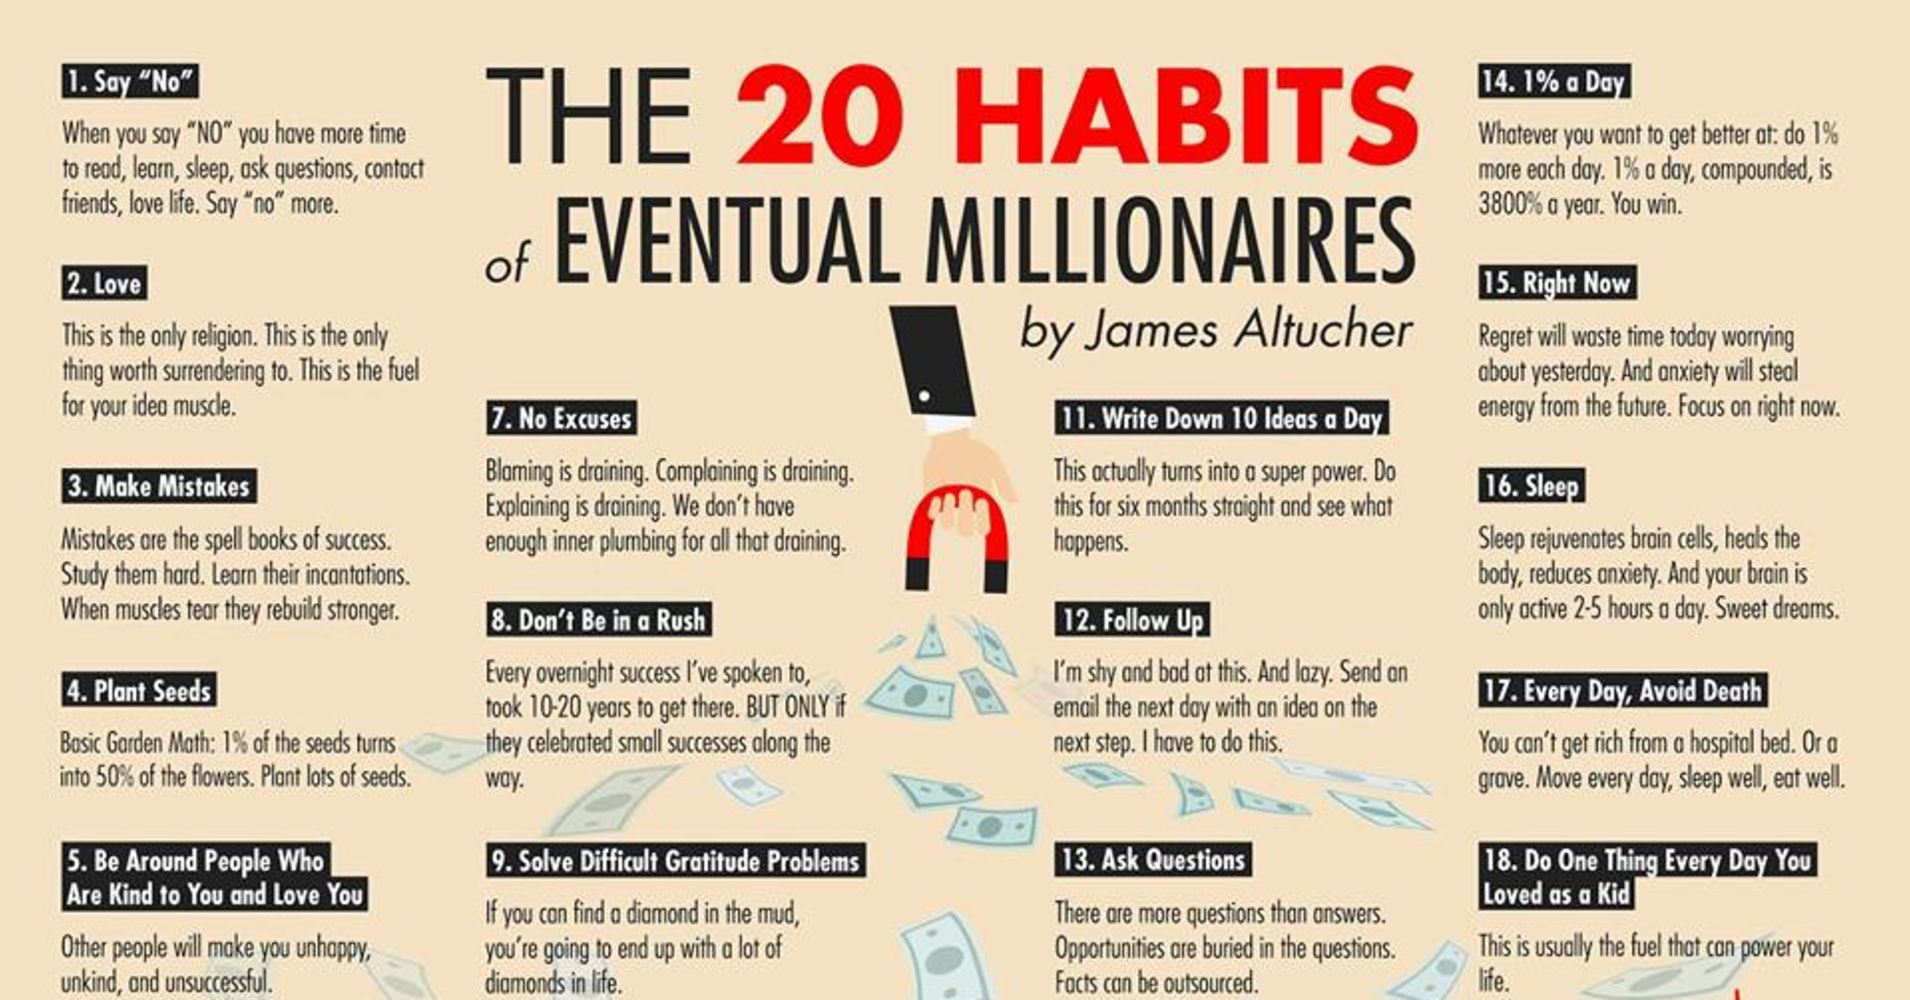 The 20 Habits Of Eventual Millionaires Millionaire James